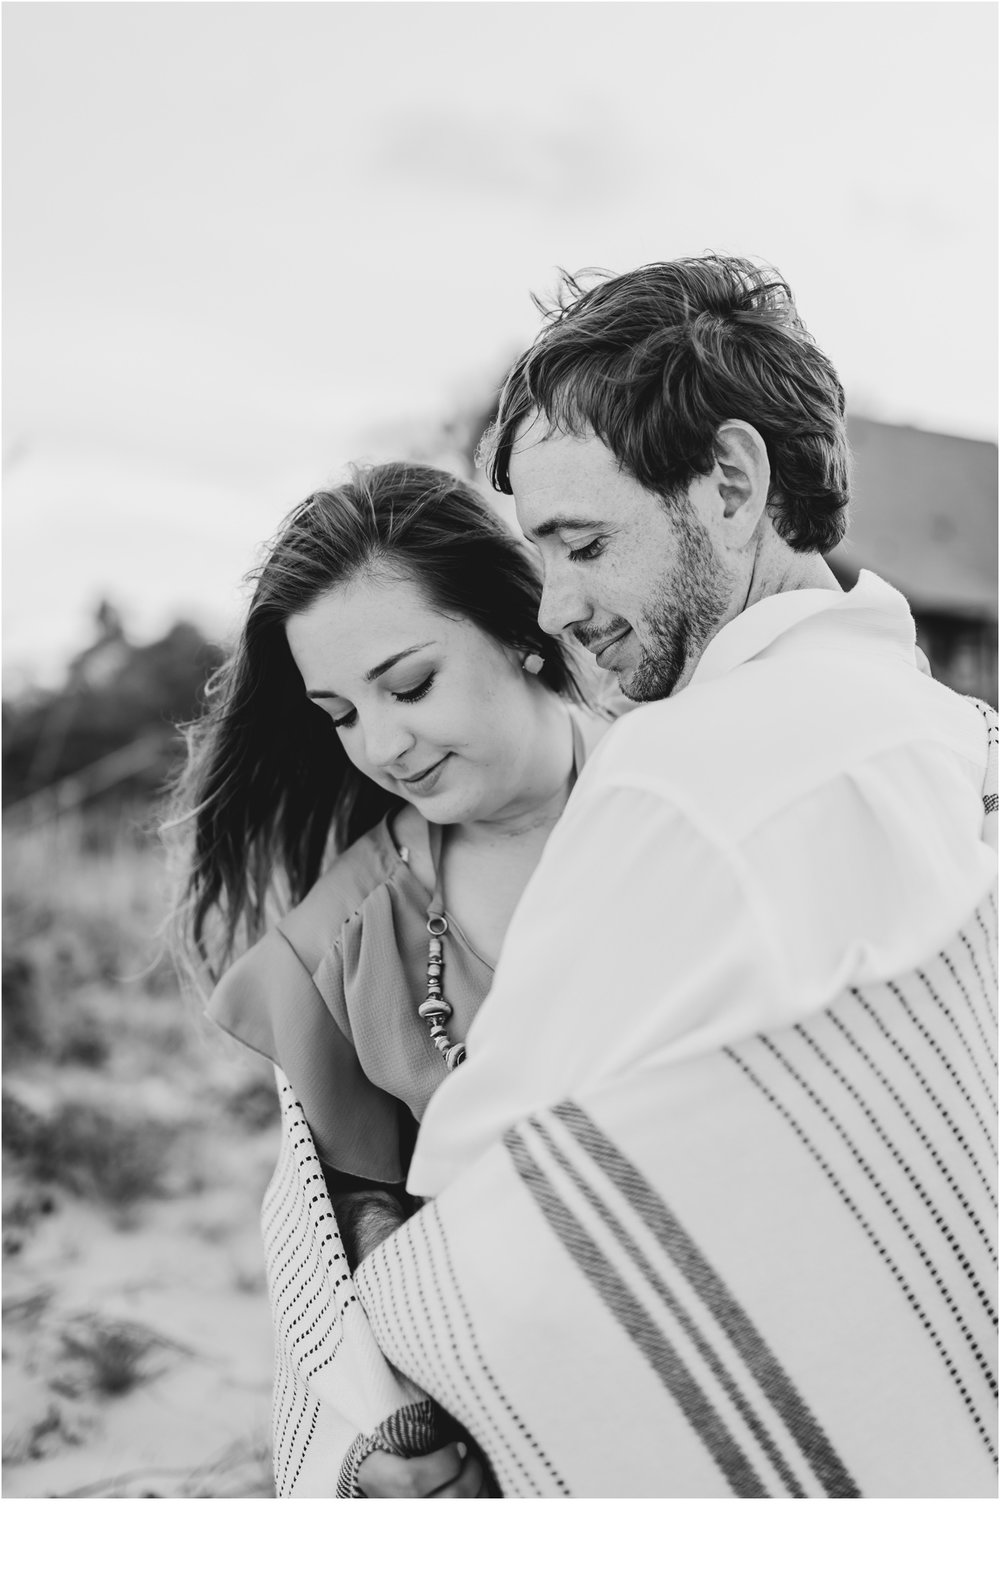 Rainey_Gregg_Photography_St._Simons_Island_Georgia_California_Wedding_Portrait_Photography_1165.jpg